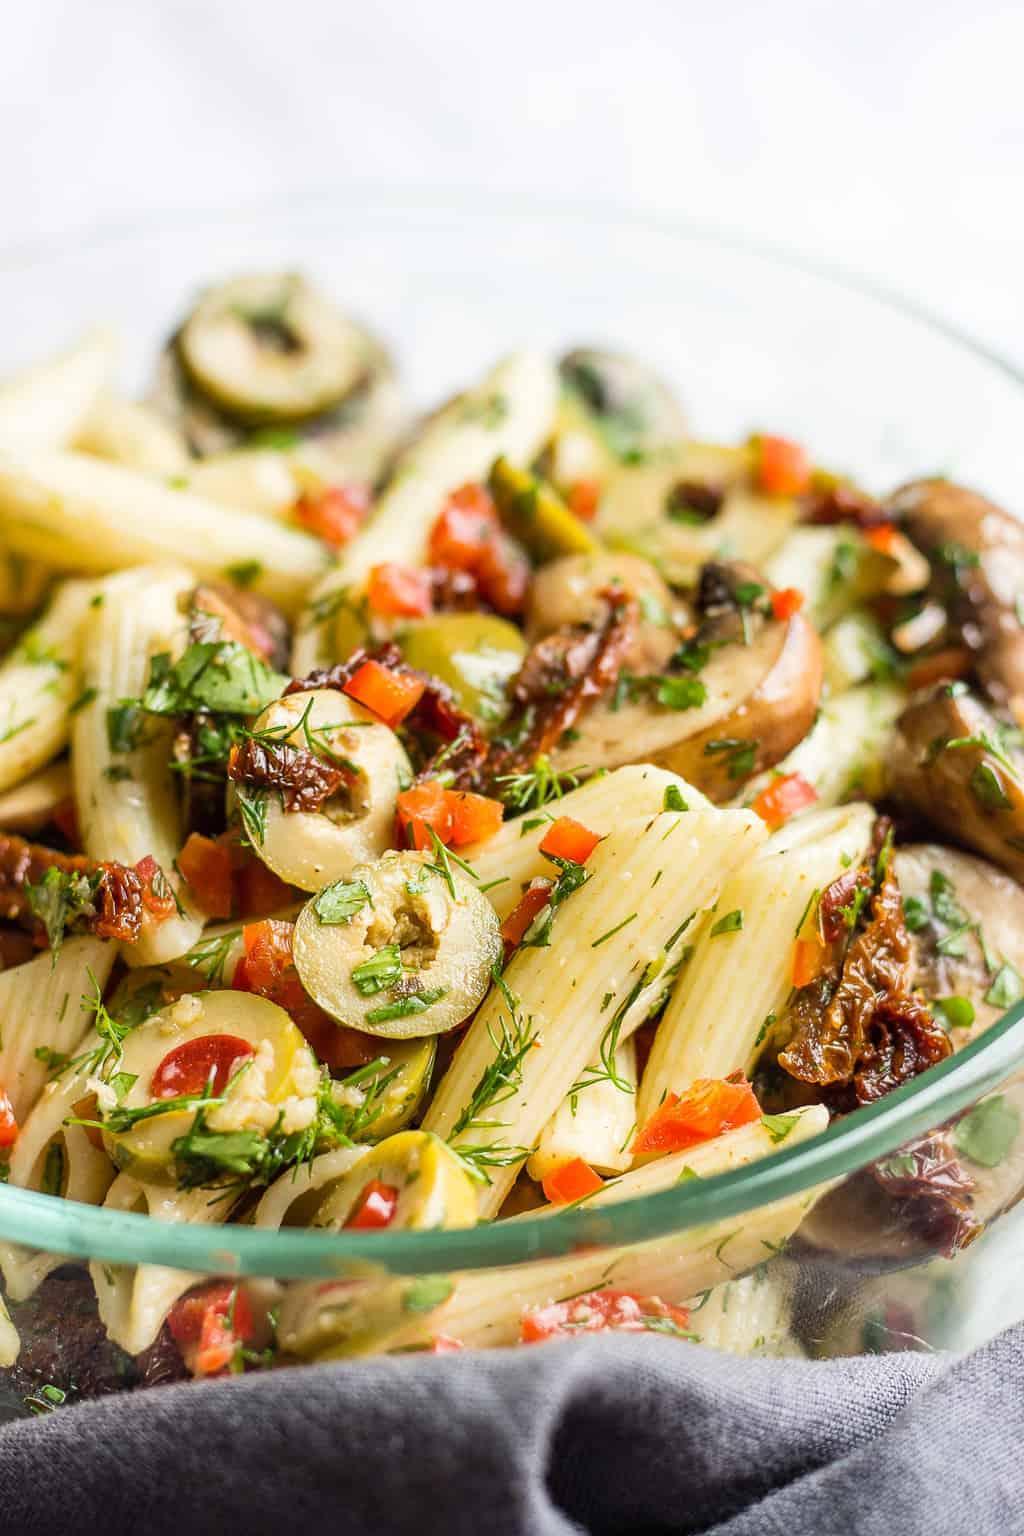 Glass bowl with healthy mushroom pasta salad